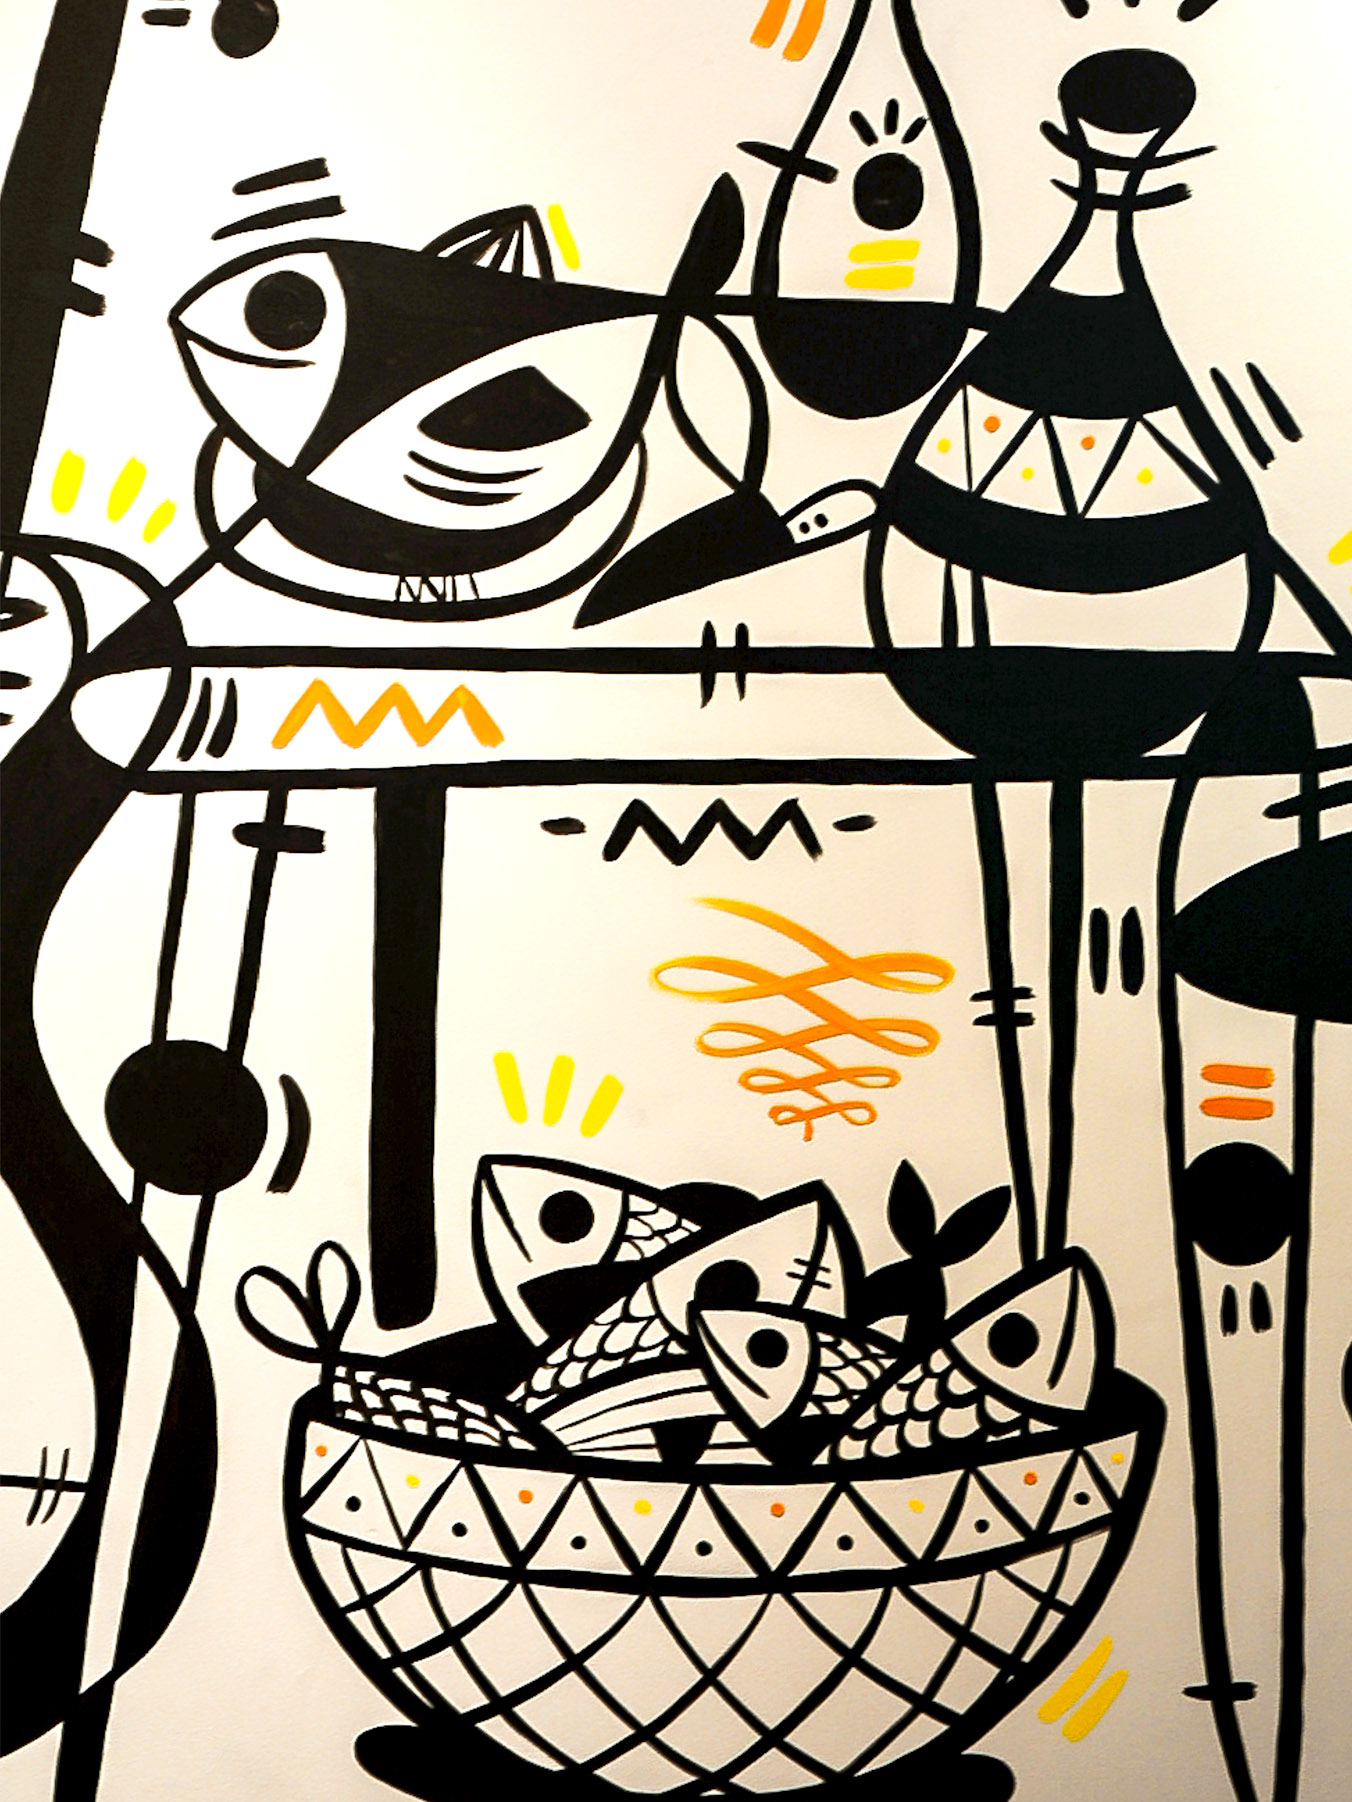 06-capsule-arts-projects-salero-tapas-bodega-artwork-close-up.jpg